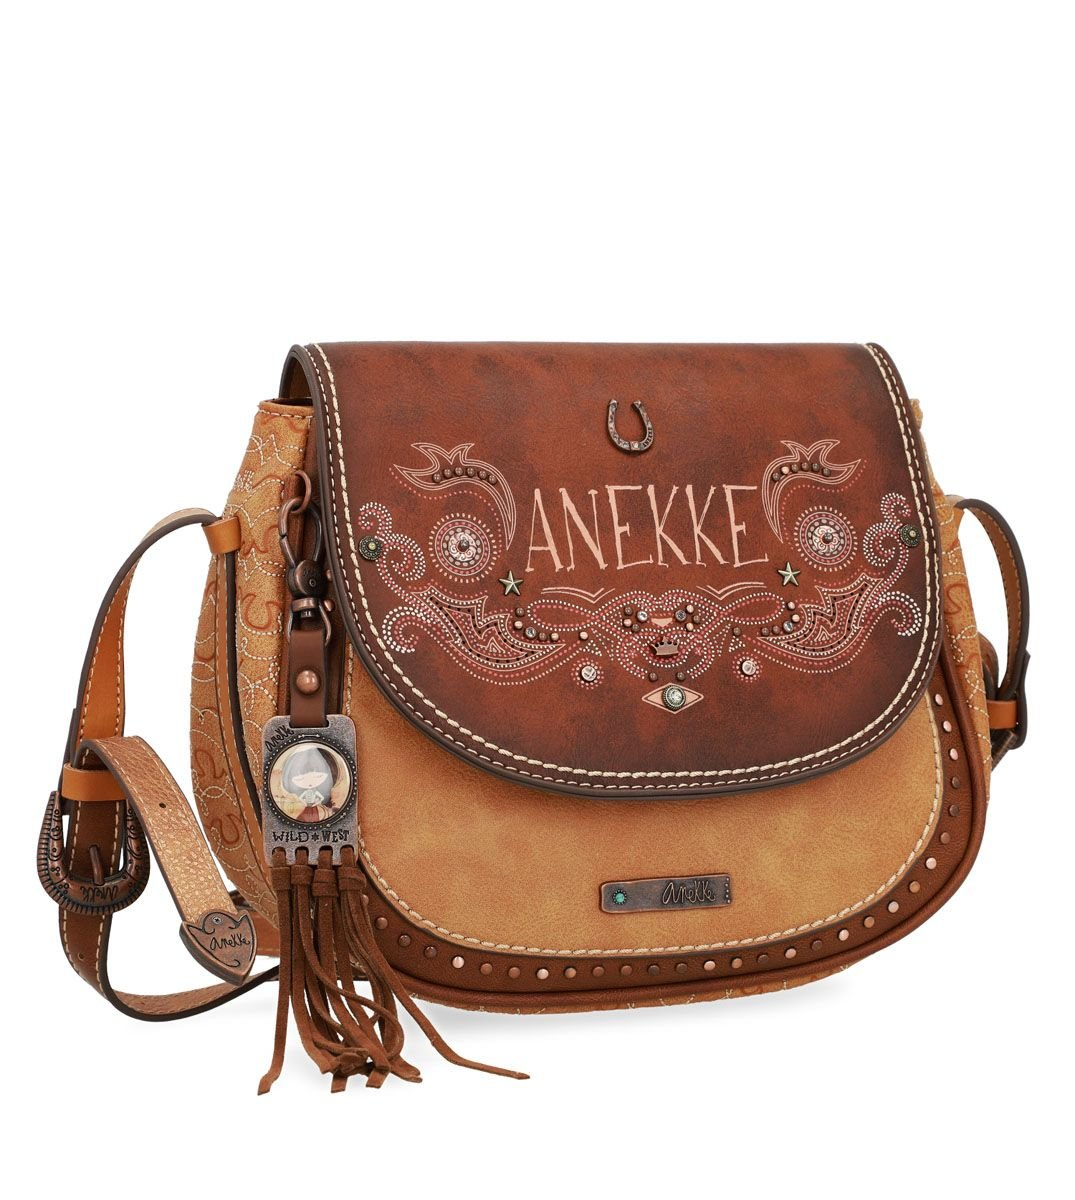 Anekke malá kabelka přes rameno Arizona s klopou